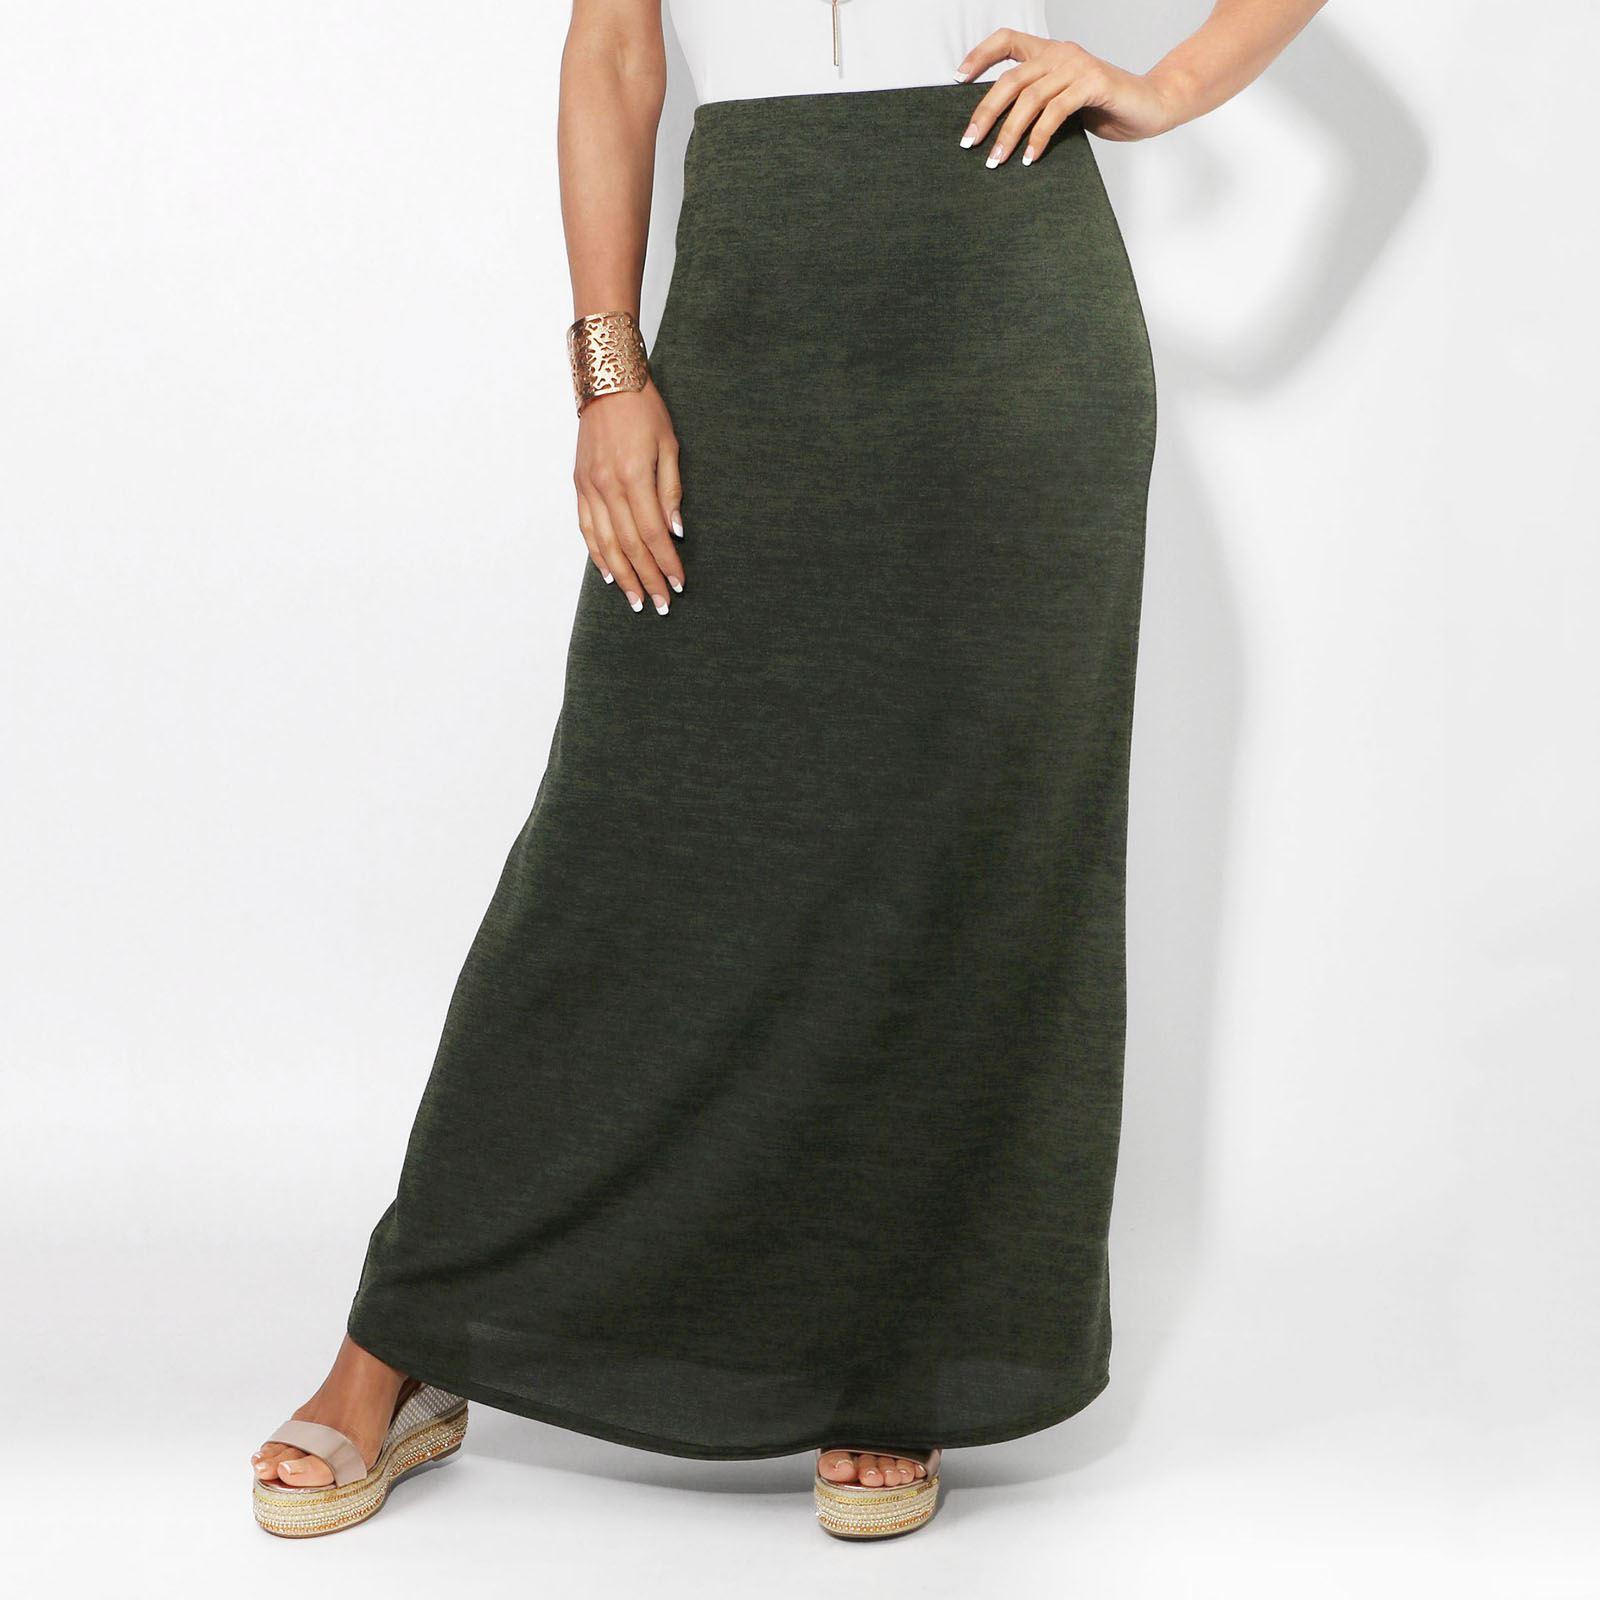 12f9d28e8 Detalles de Falda Mujer Larga Ajustada Cintura Alta Elástica Elegante  Casual Trapecio Lisa